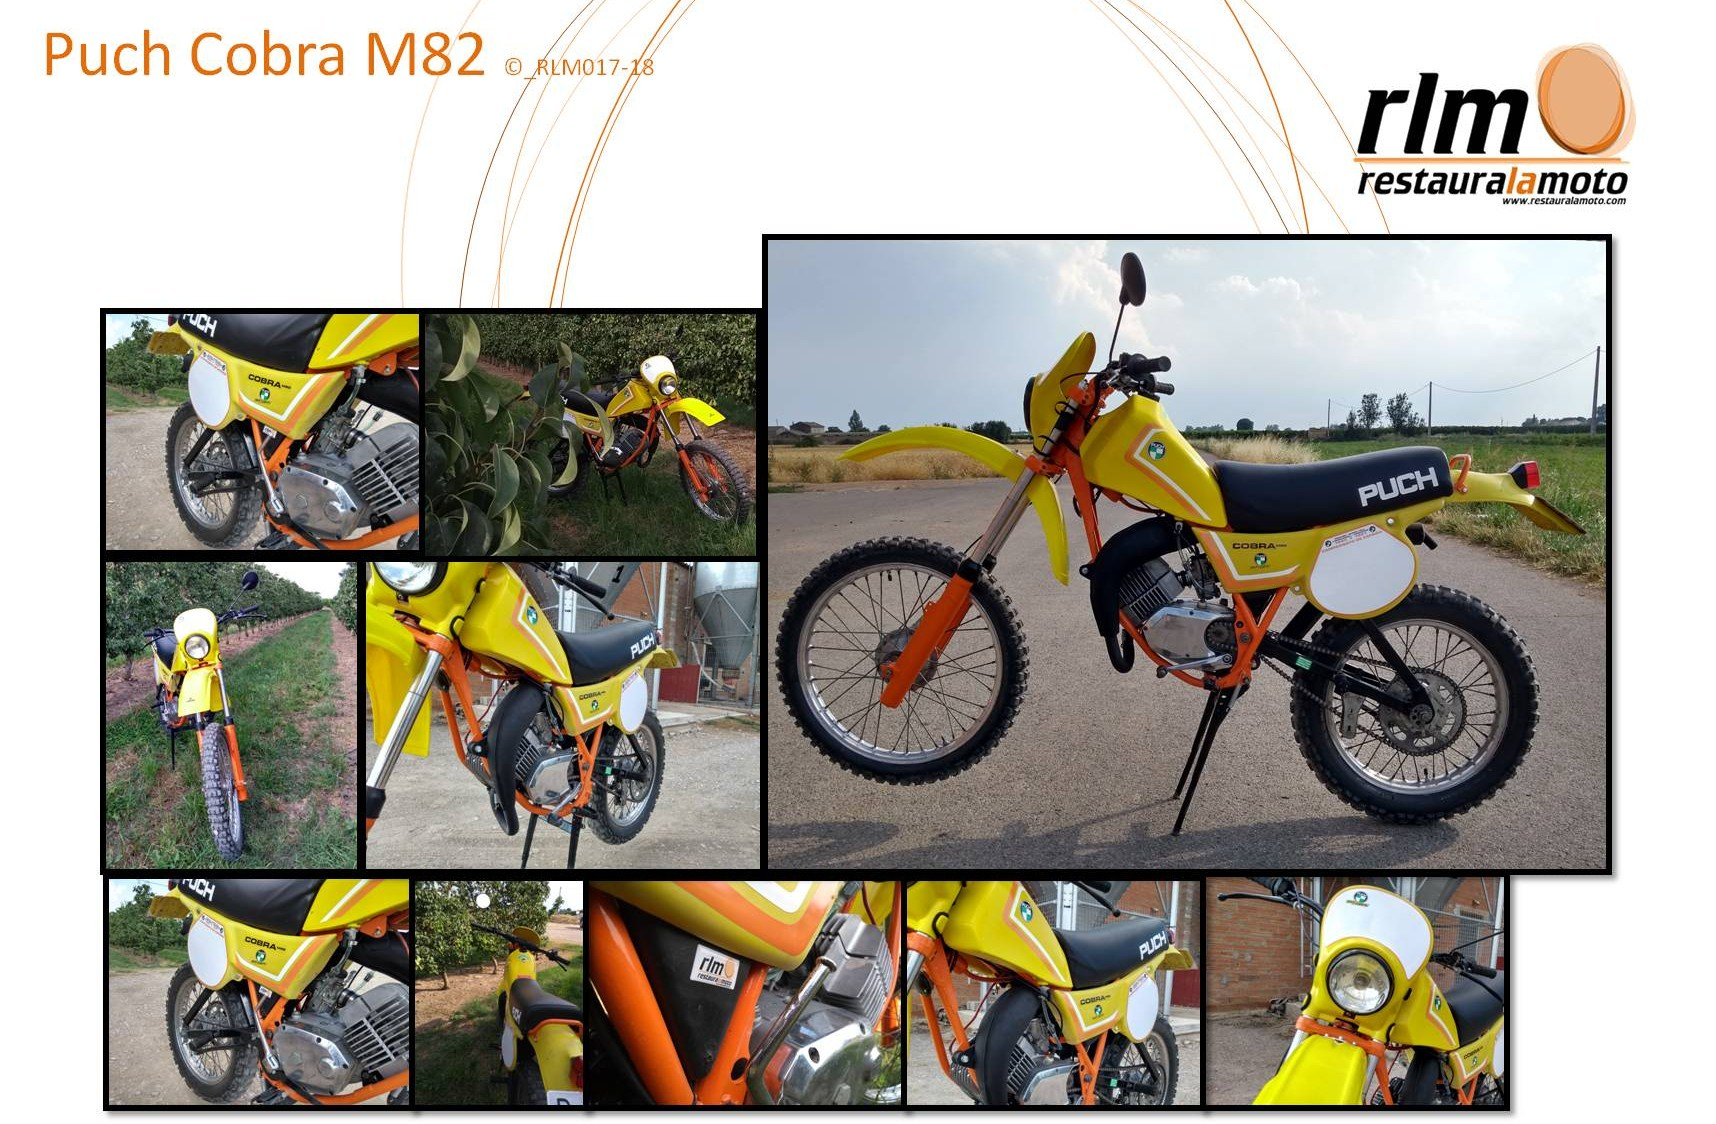 Puch Cobra M82